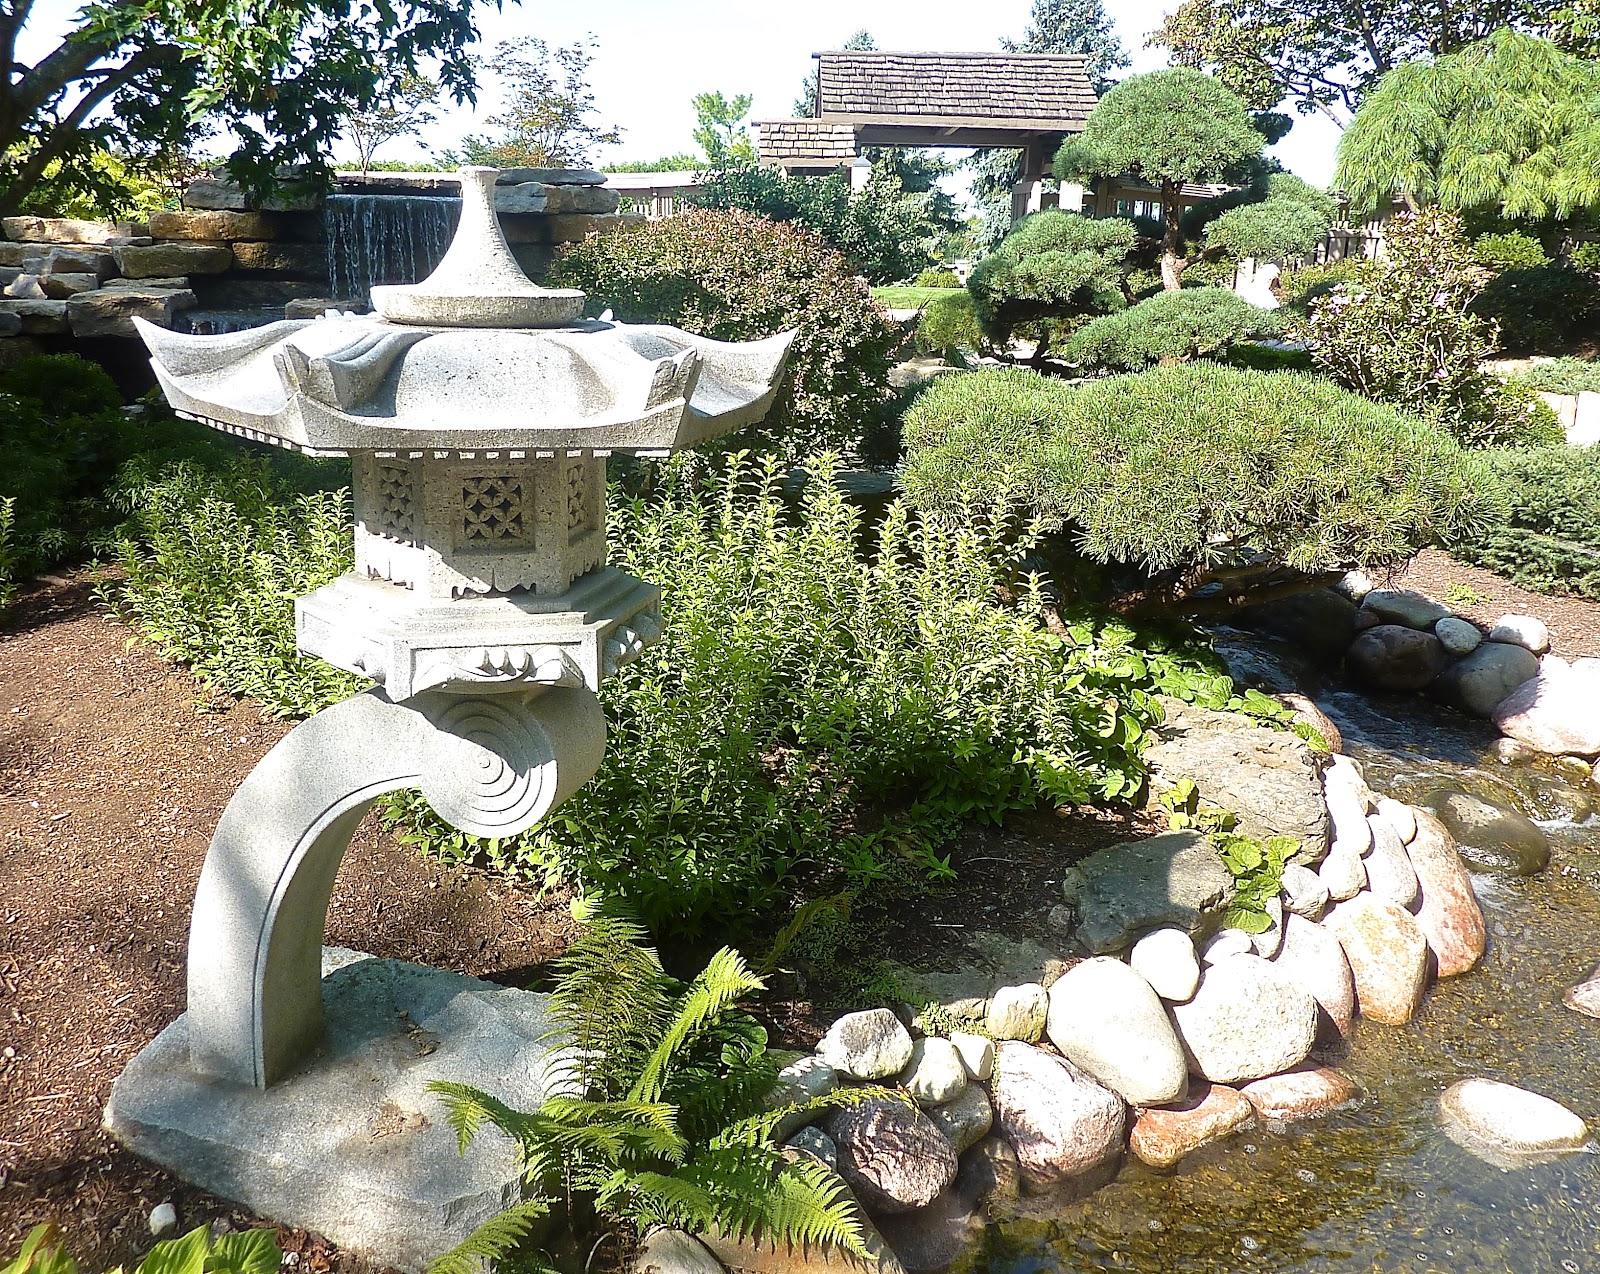 Visit To Rotary Botanical Gardens, Janesville, WI